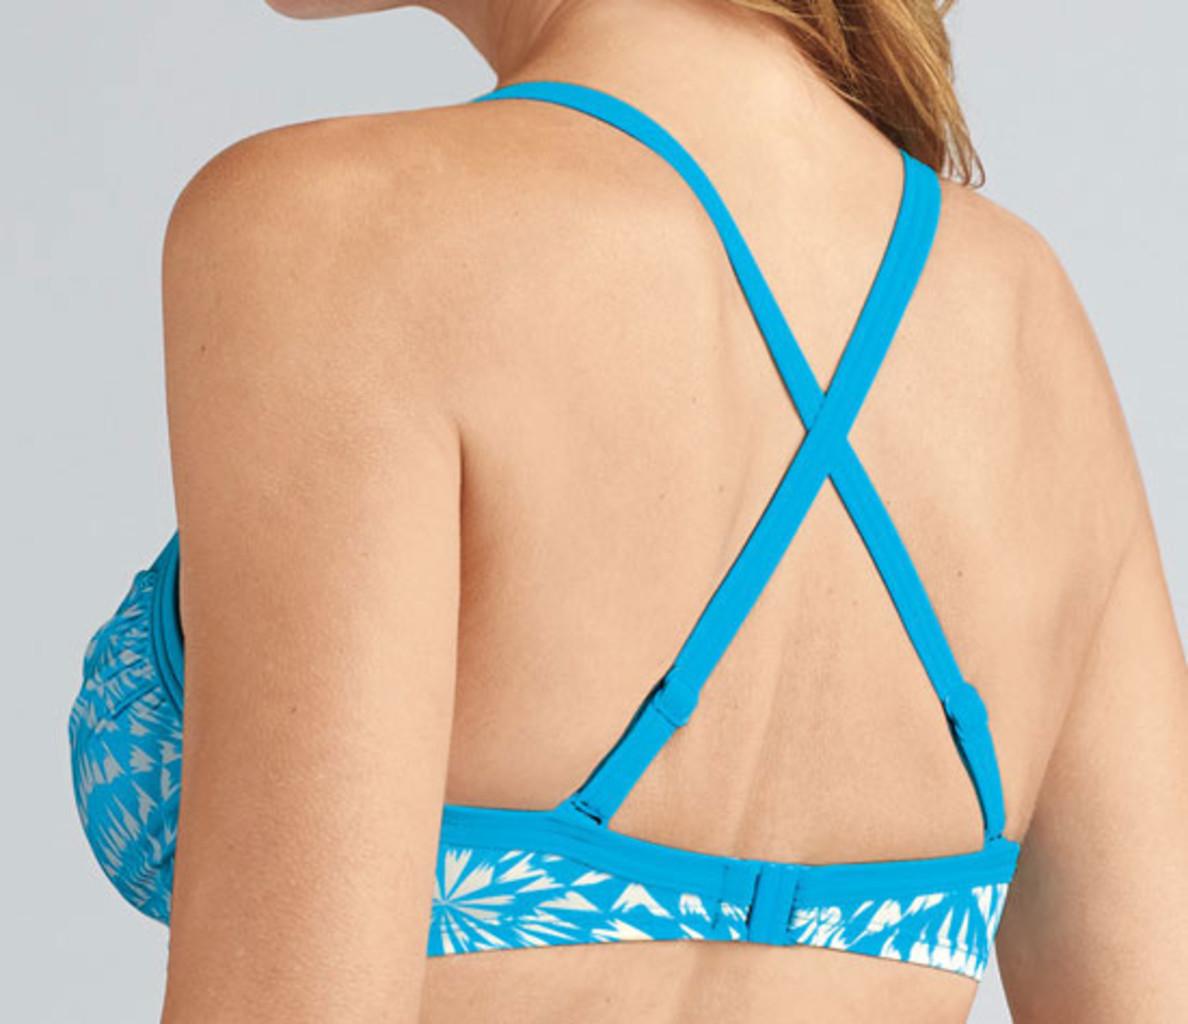 Amoena Amoena Hawaii prothese bikini zonder beugel kleur turqouise met wit